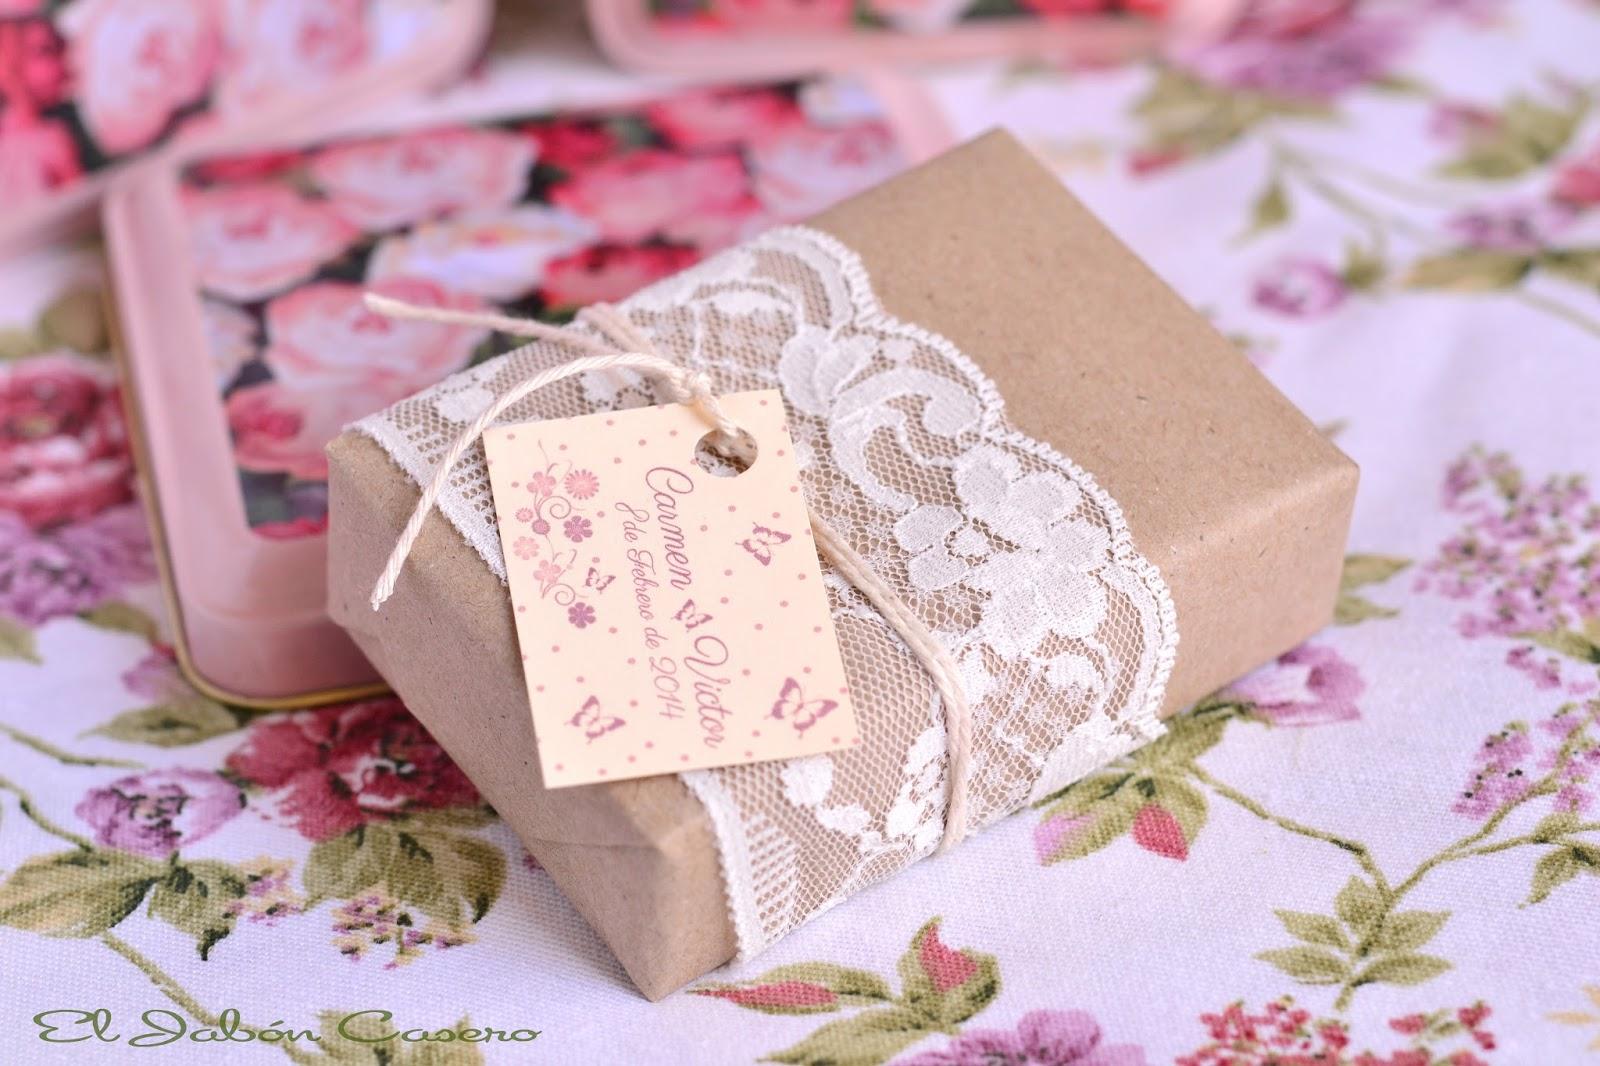 Detalles de bodas jabones encajes - Detalles para regalar en boda ...